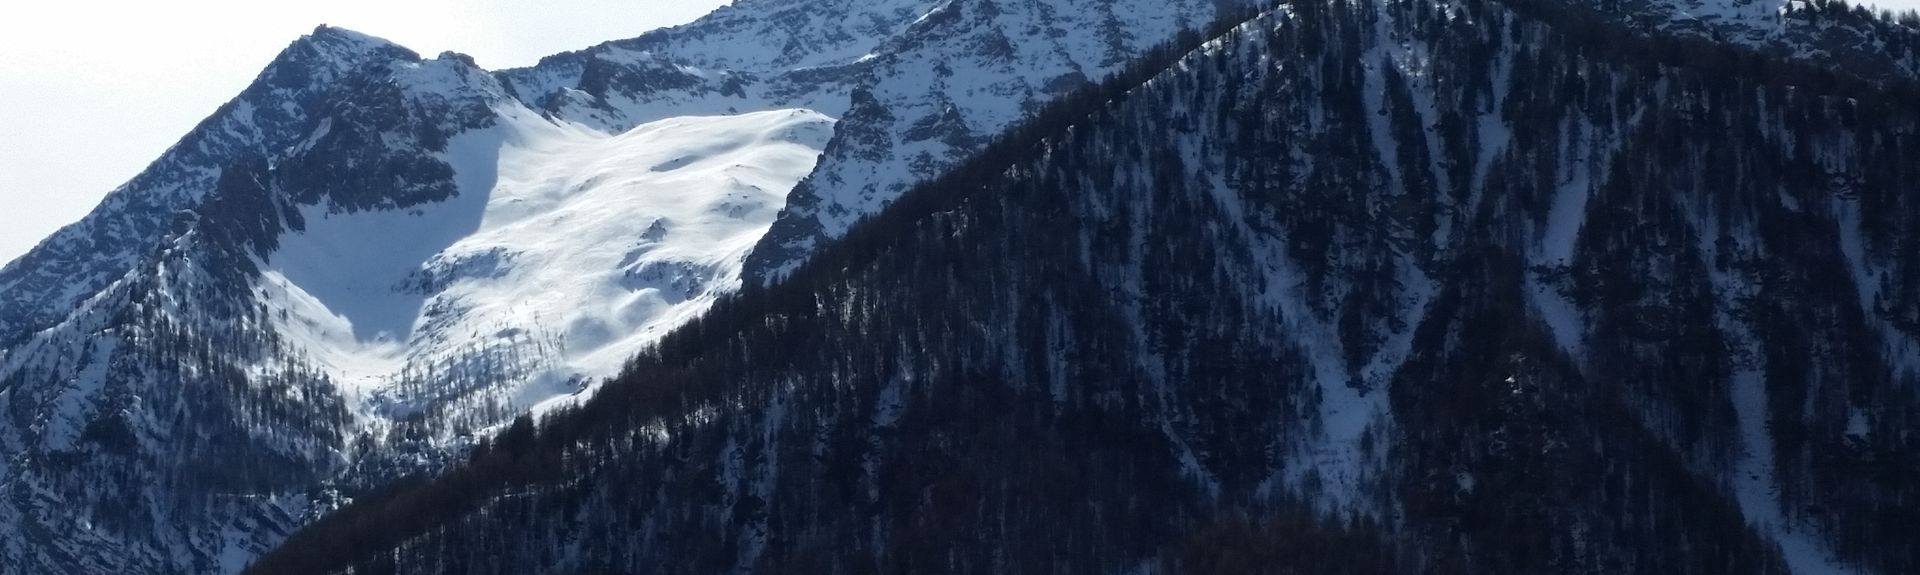 Ski Lodge - La Sellette Ski Lift, San Sicario Alto, Italy